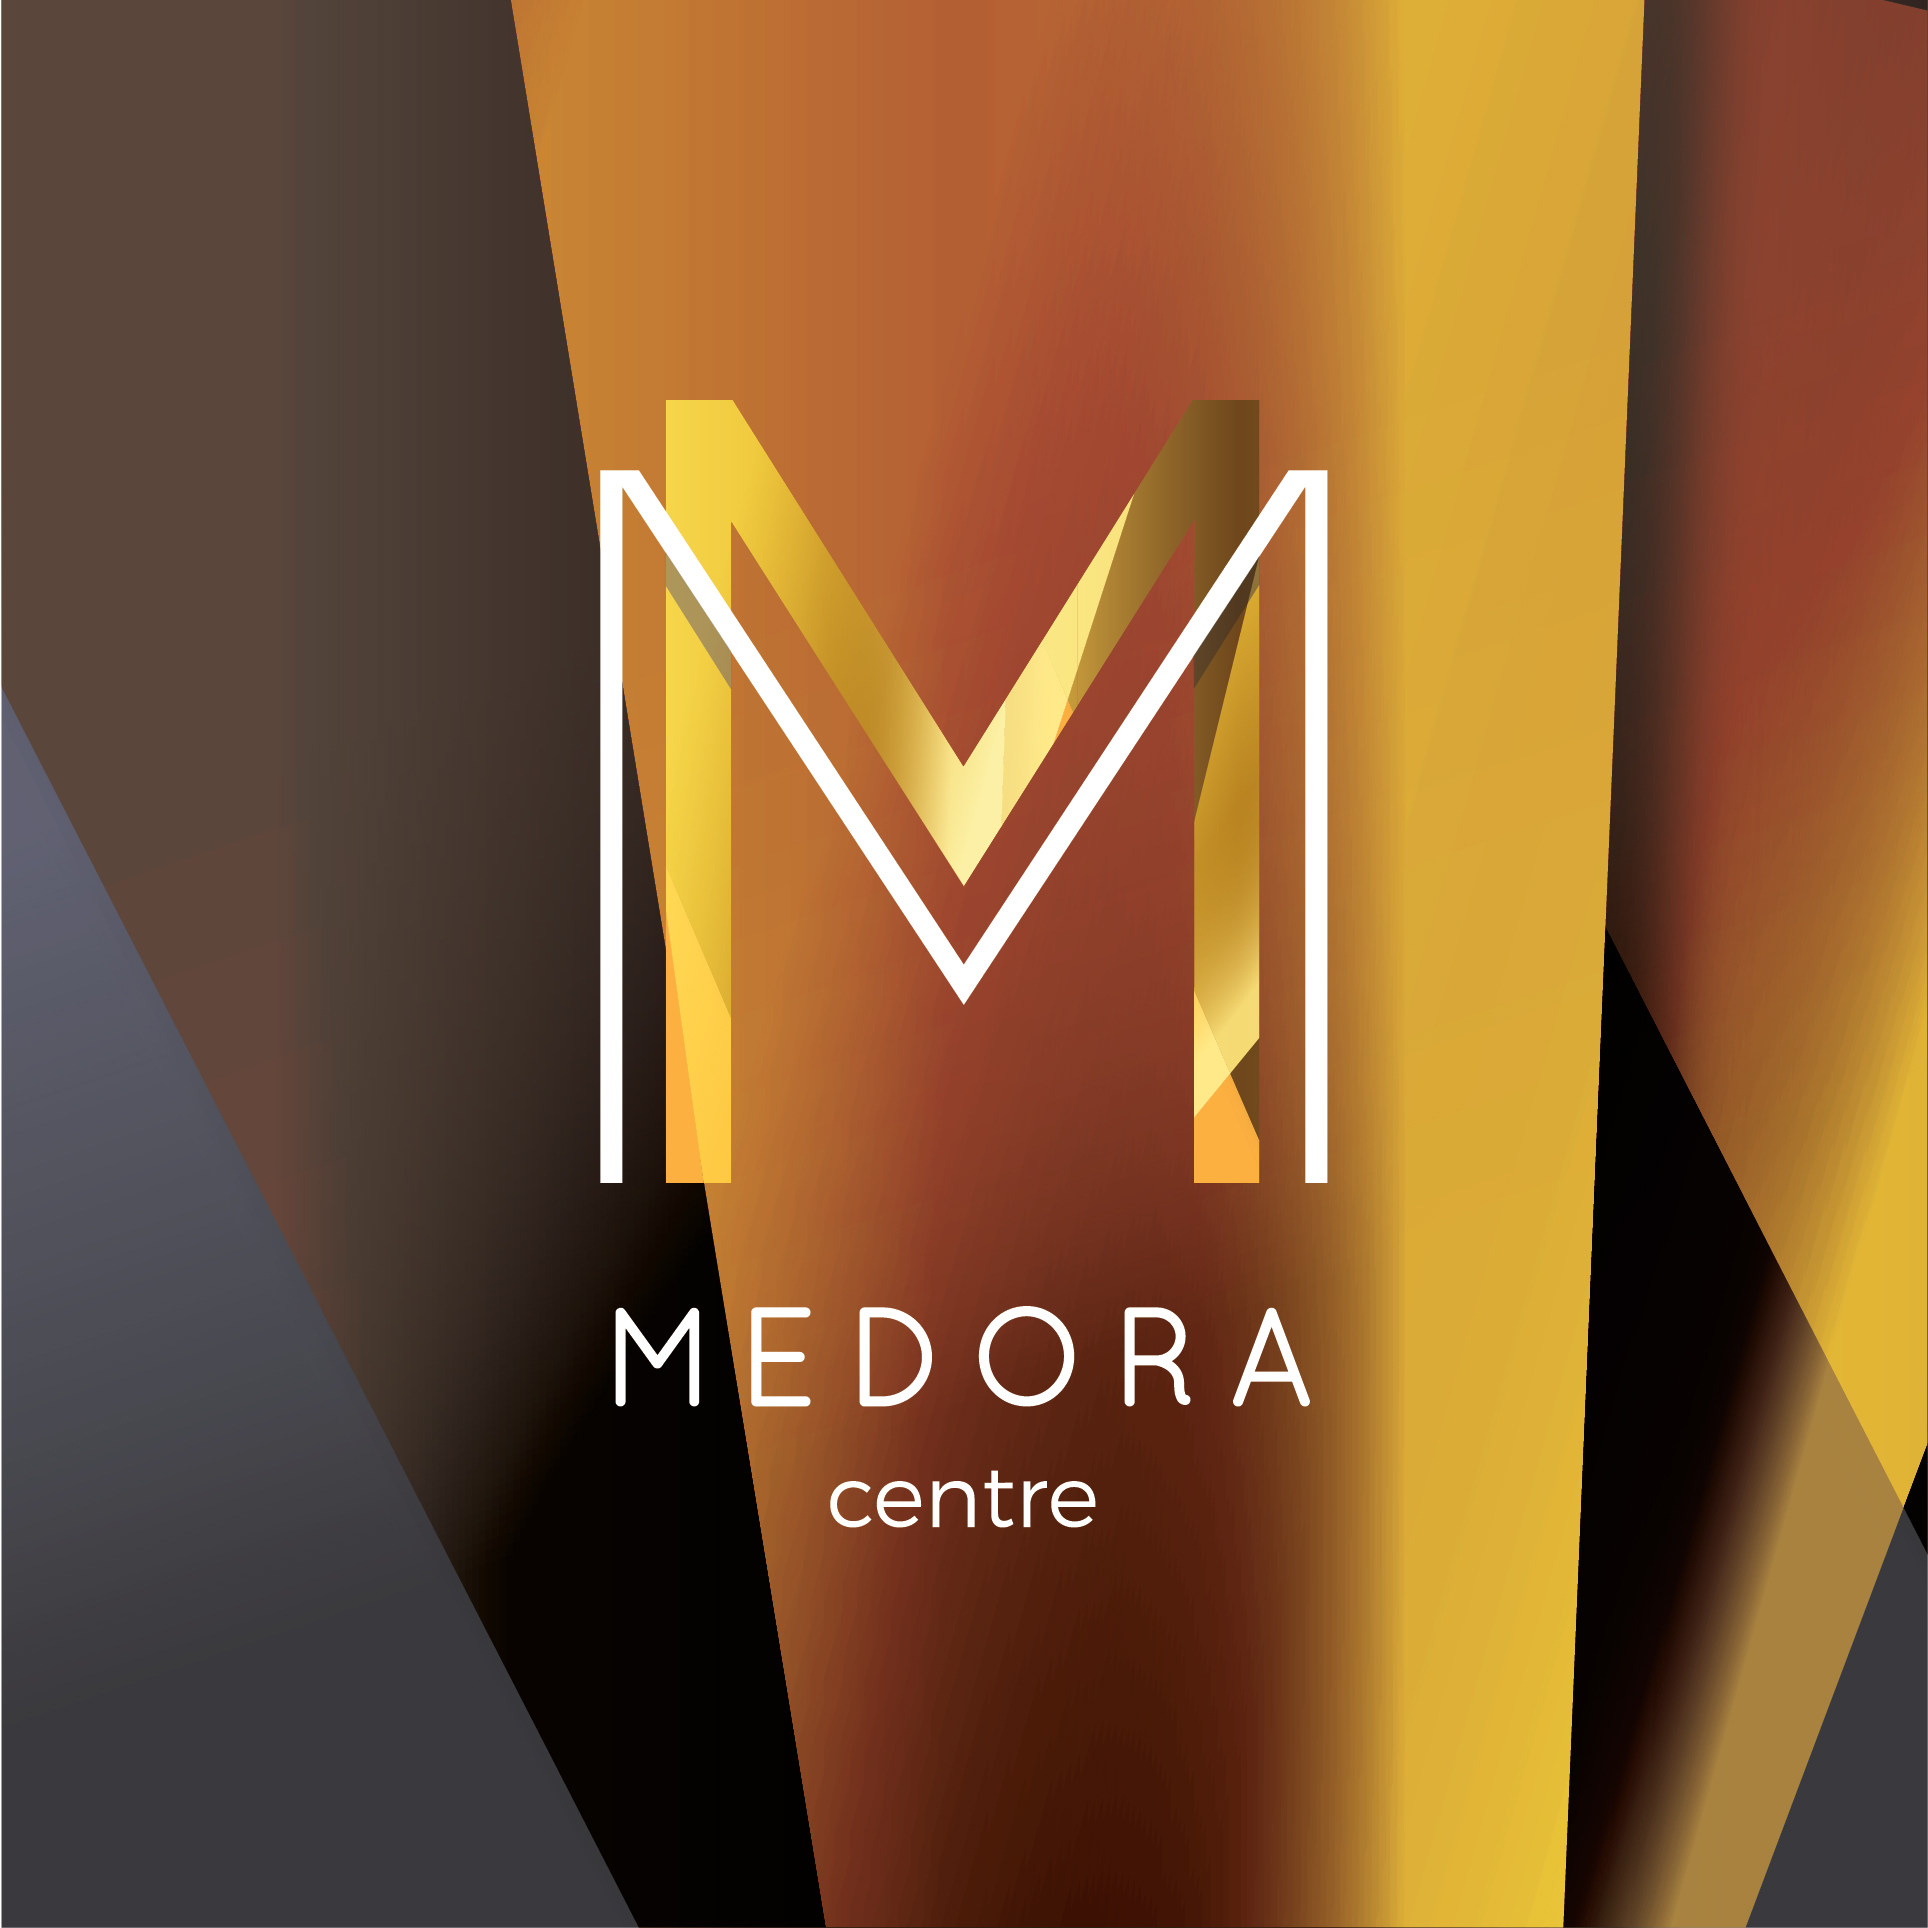 Medora Centre